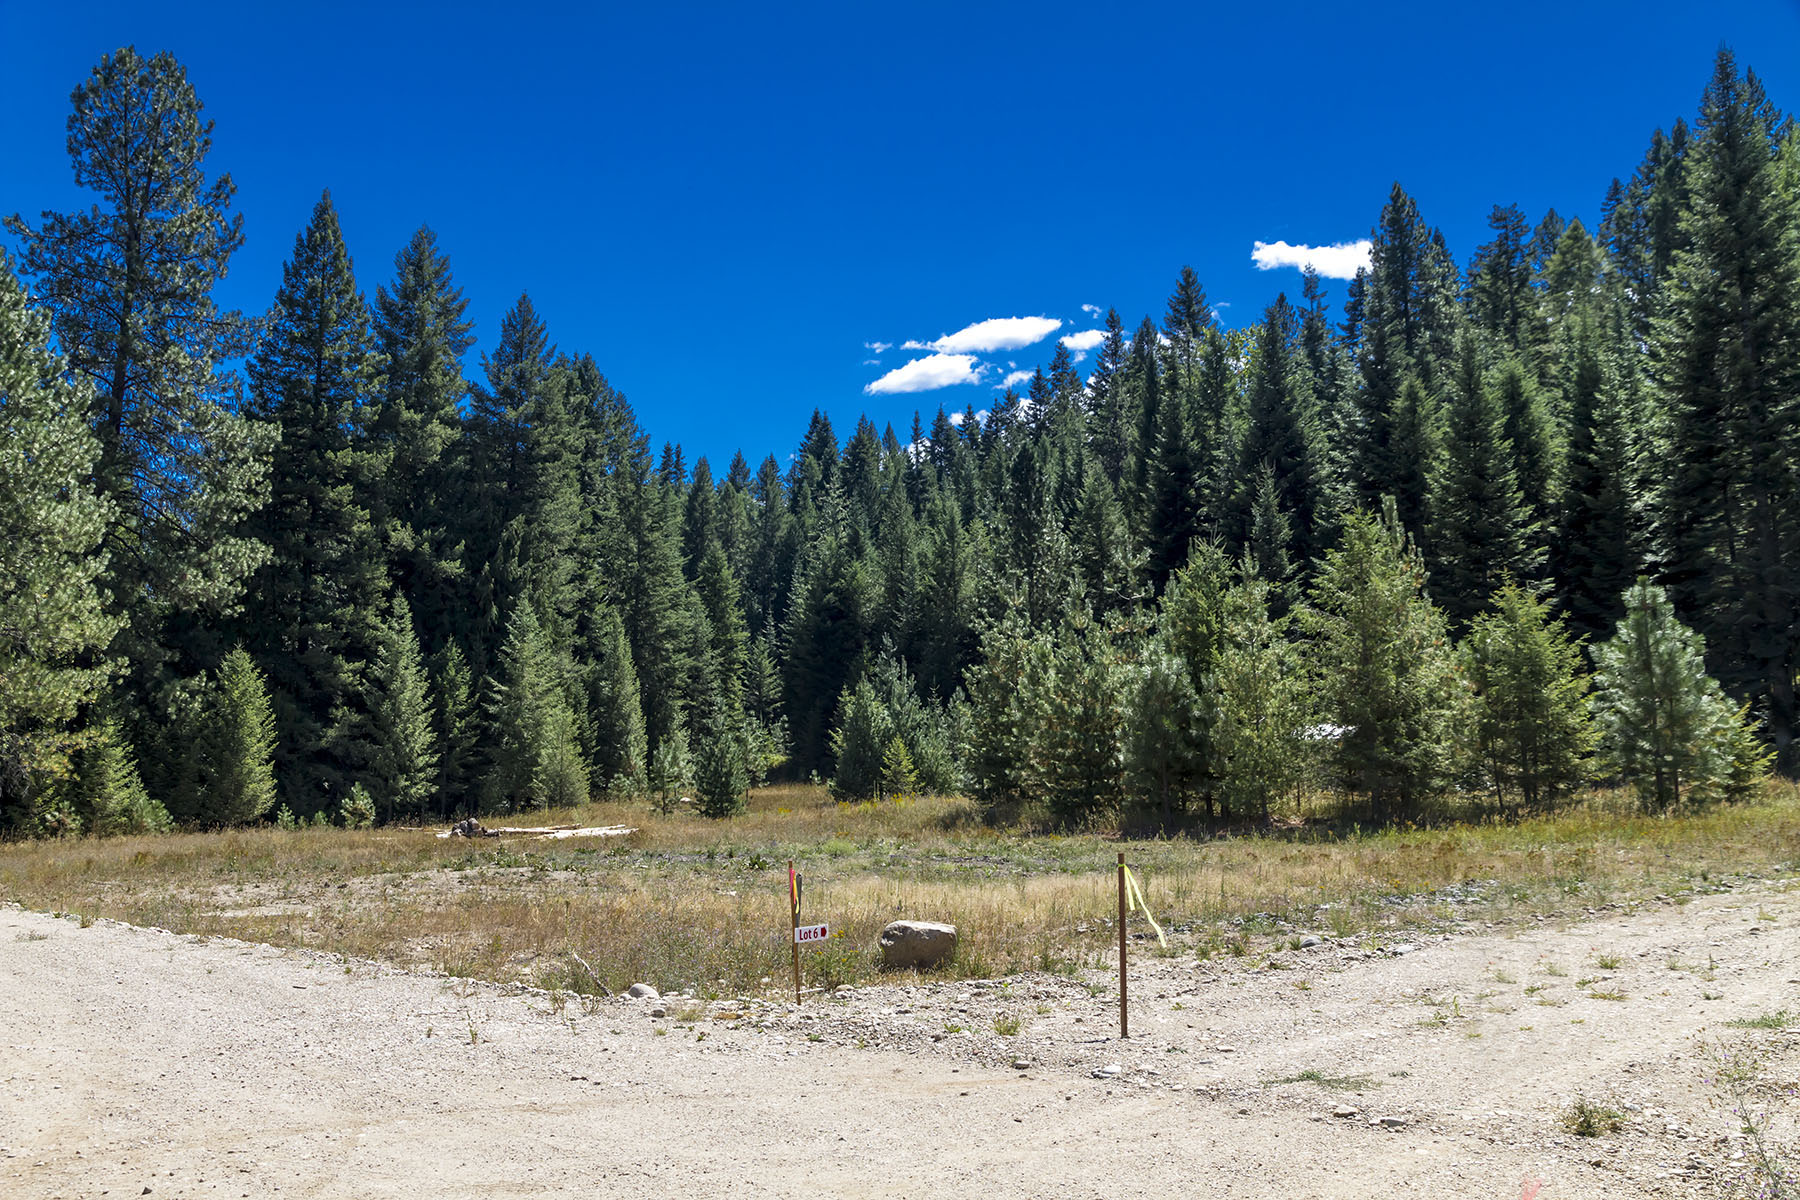 Land for Sale at Creek frontage & Community boat slip Lot 6 Sailor Lane Priest River, Idaho 83856 United States